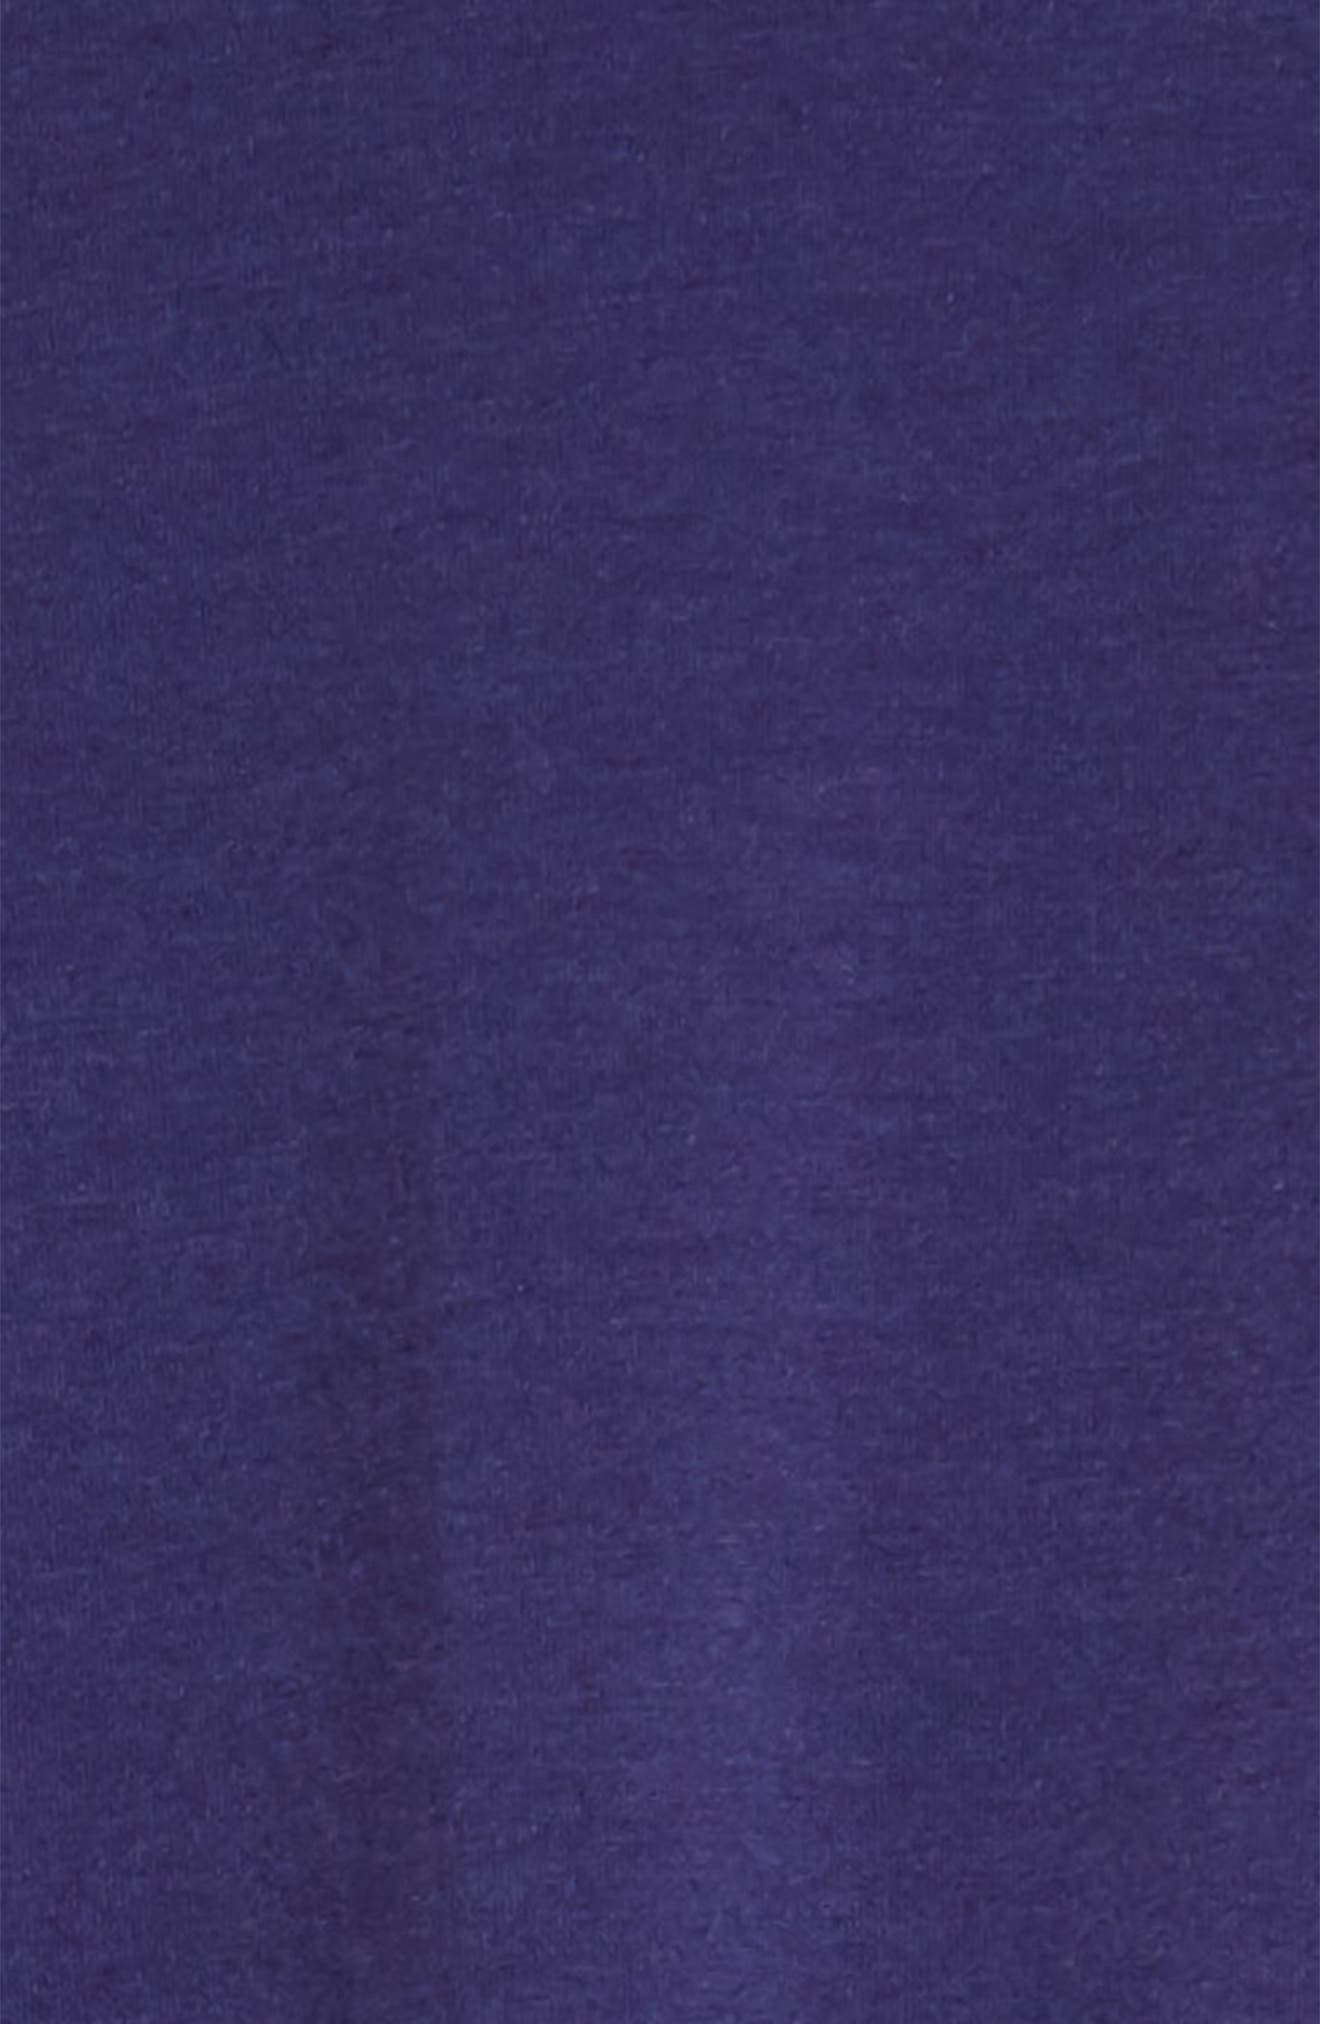 Popover Knit Tank Dress,                             Alternate thumbnail 3, color,                             410